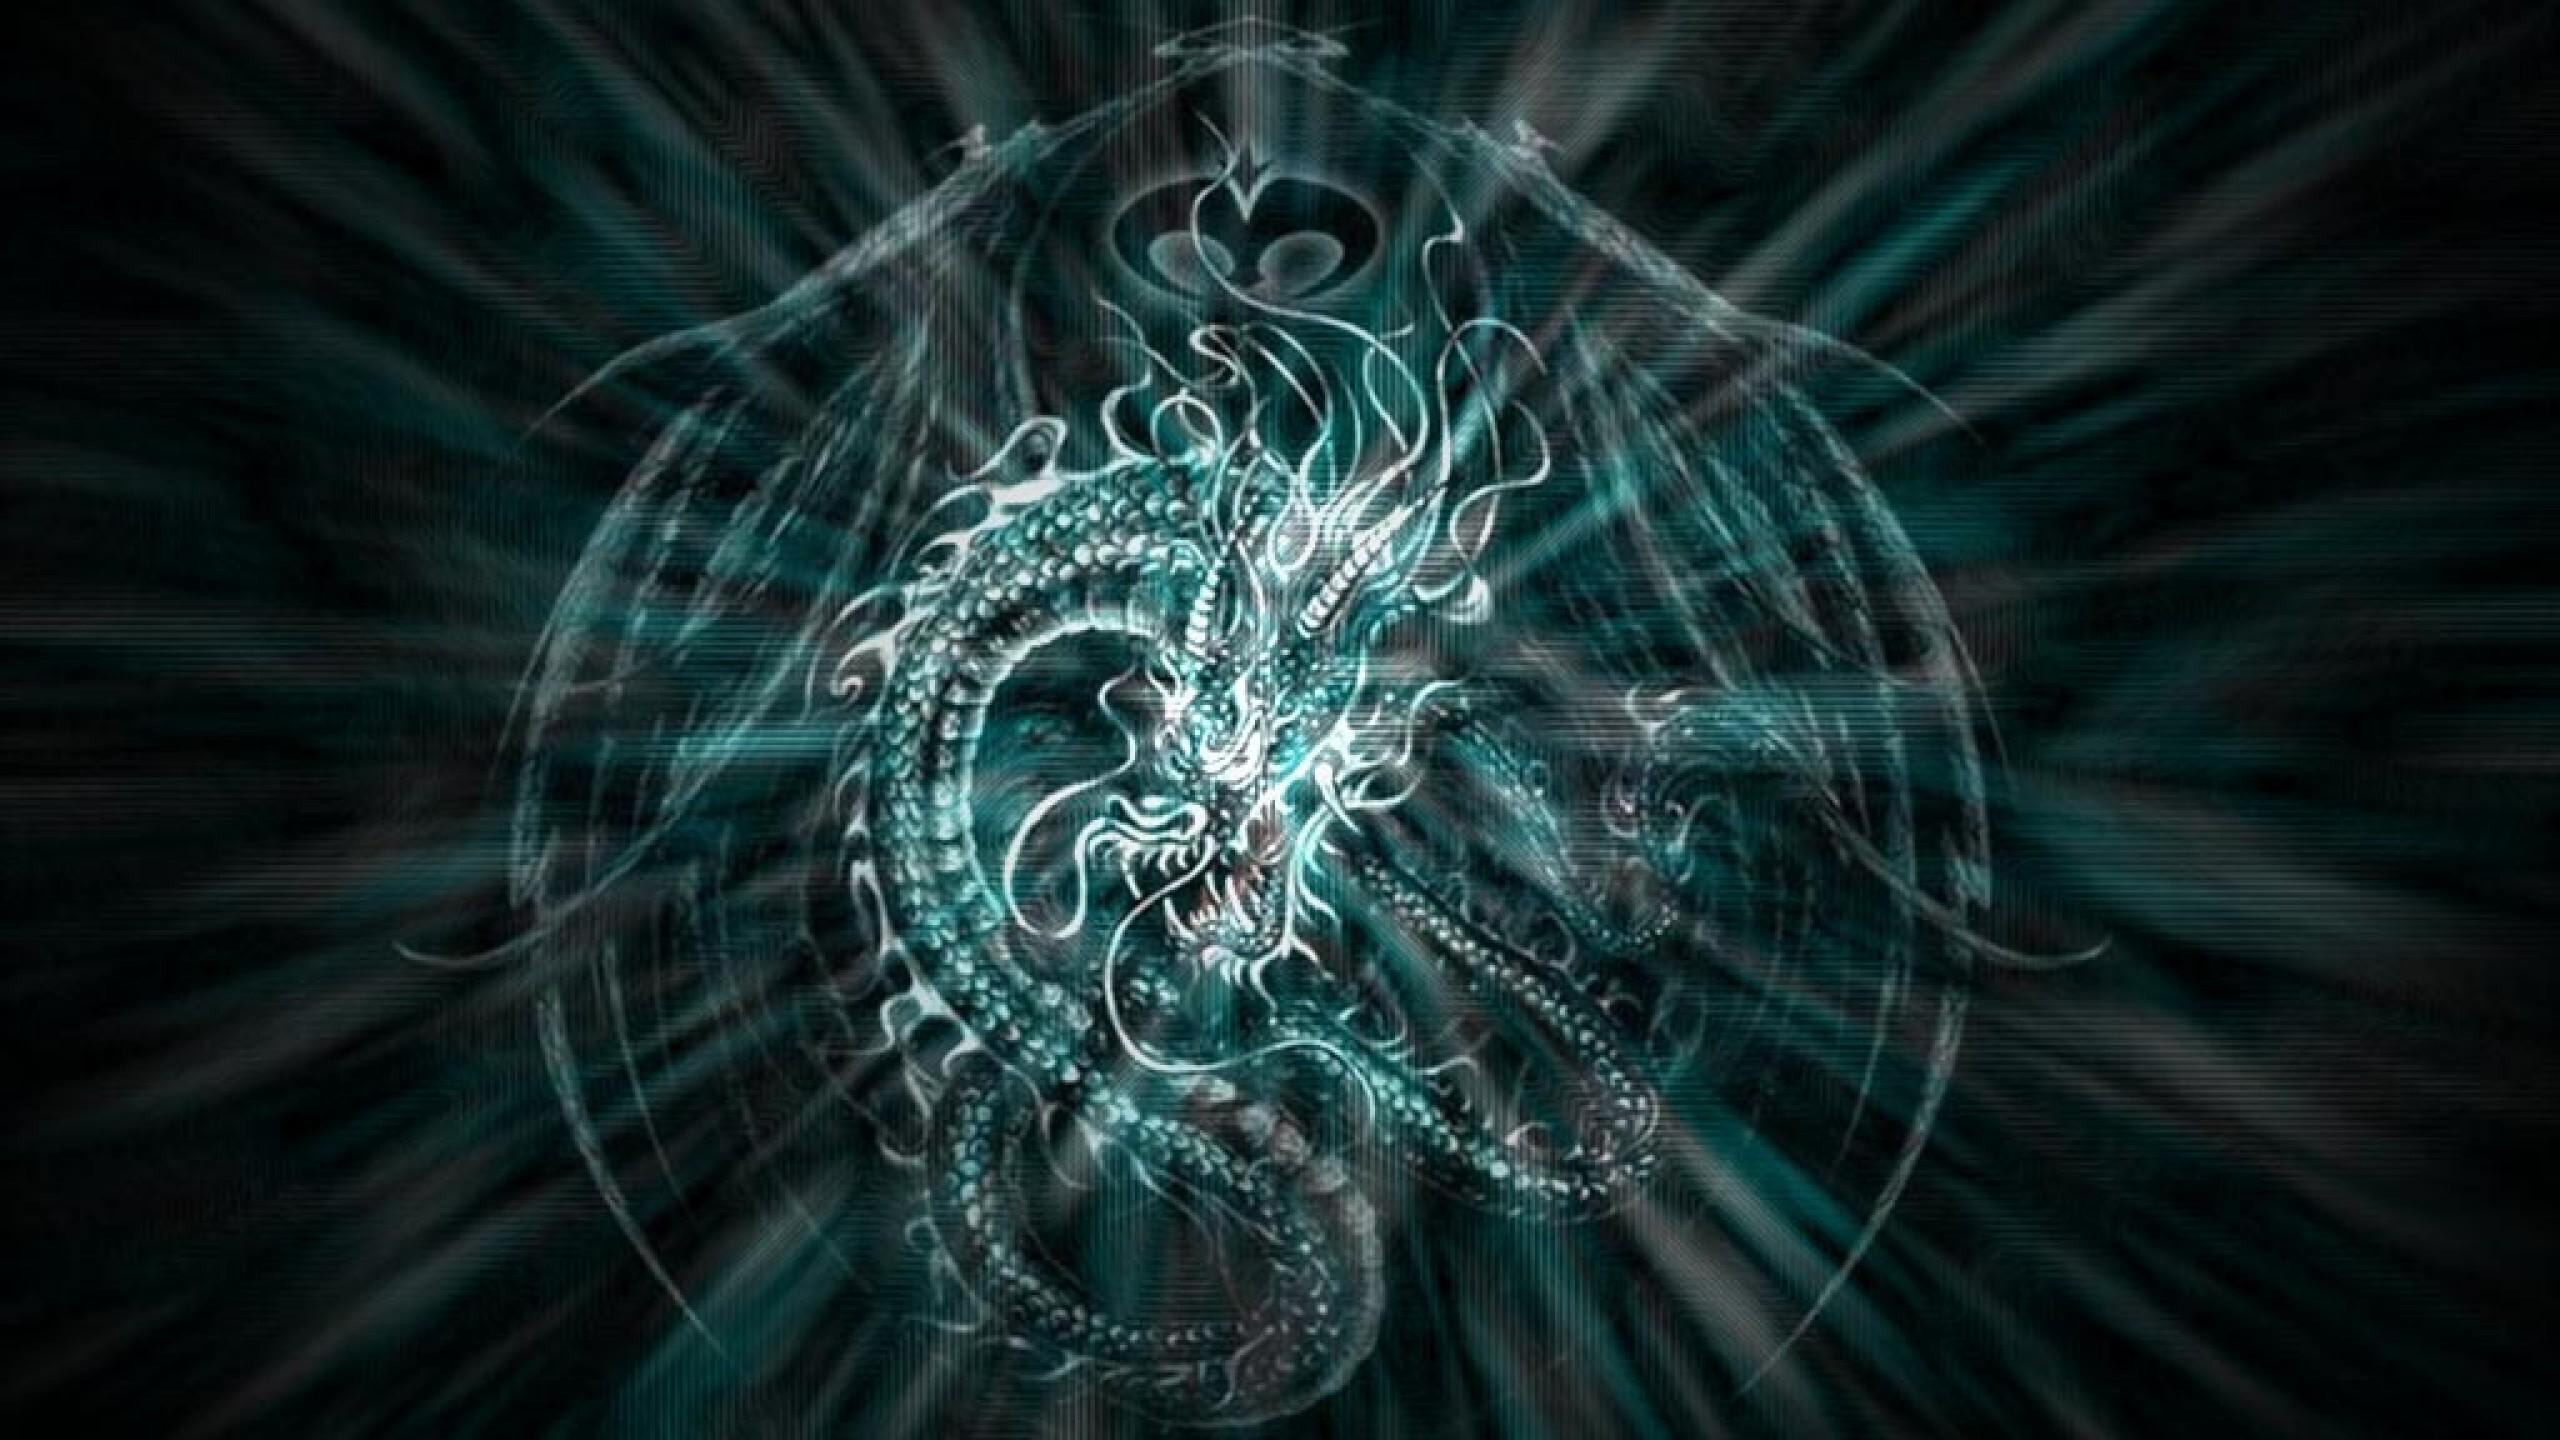 dragon desktop wallpaper With Resolutions 25601440 Pixel 2560x1440